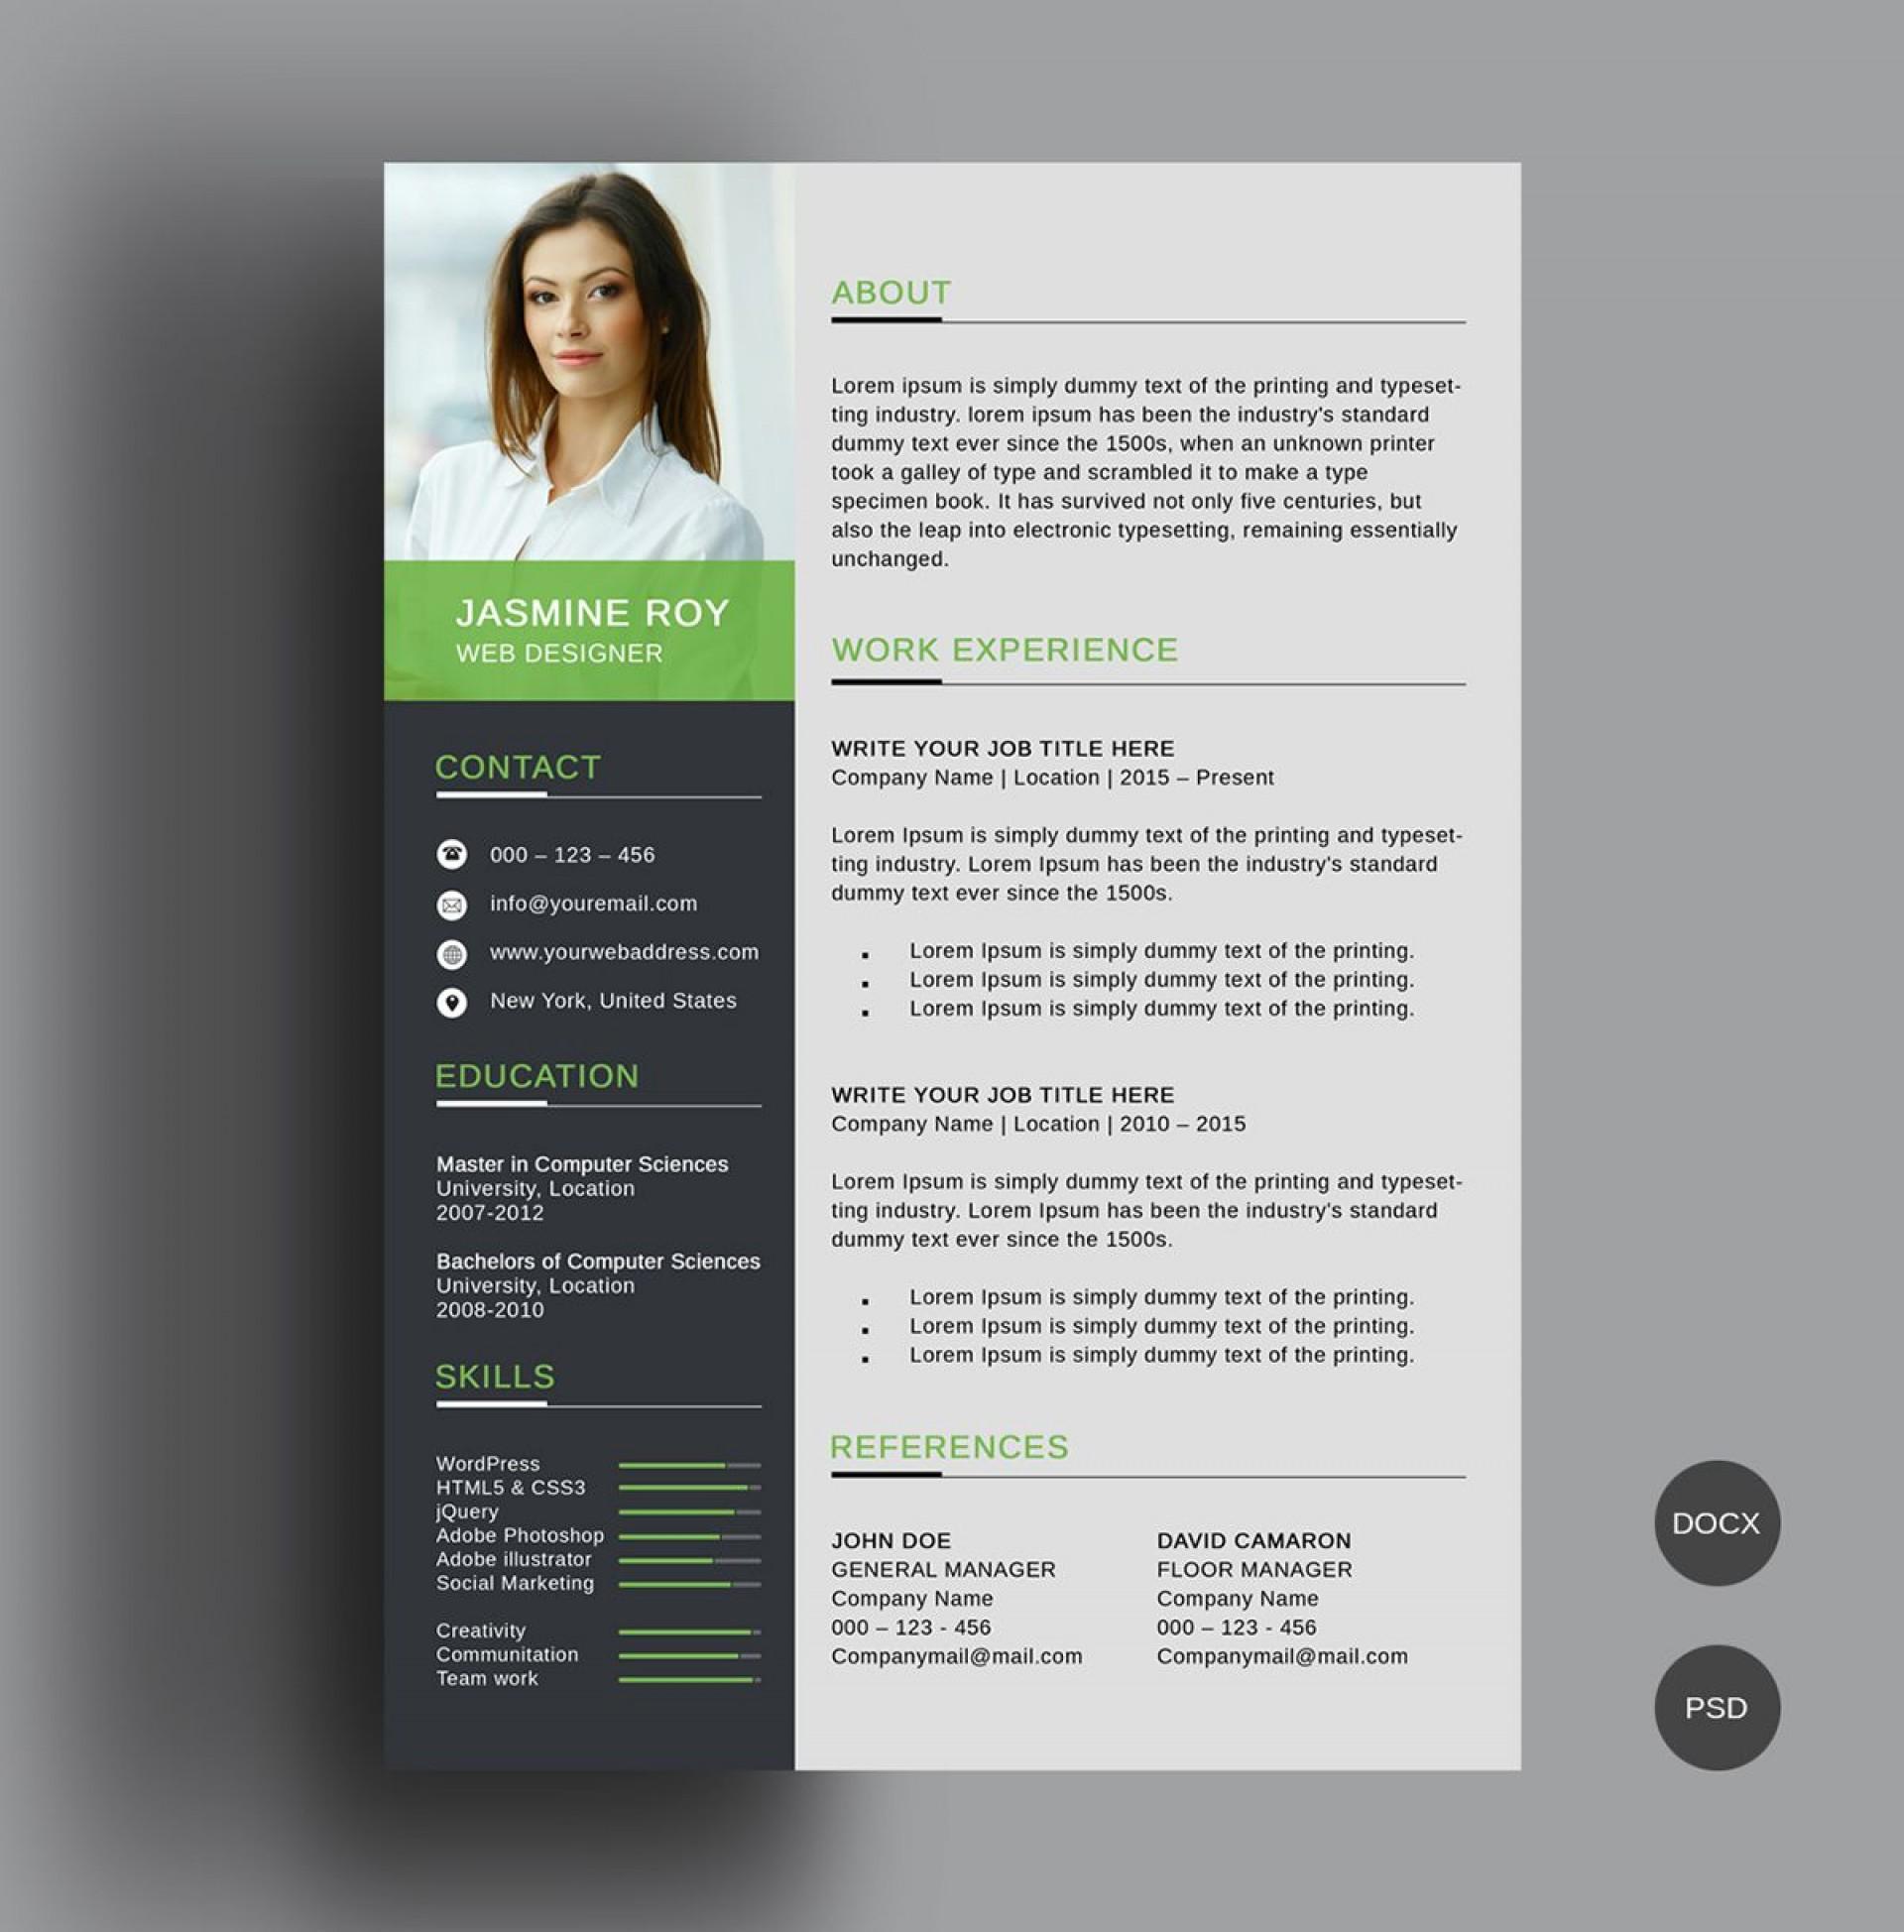 001 Excellent Photoshop Resume Template Free Download Design  Creative Cv Psd1920